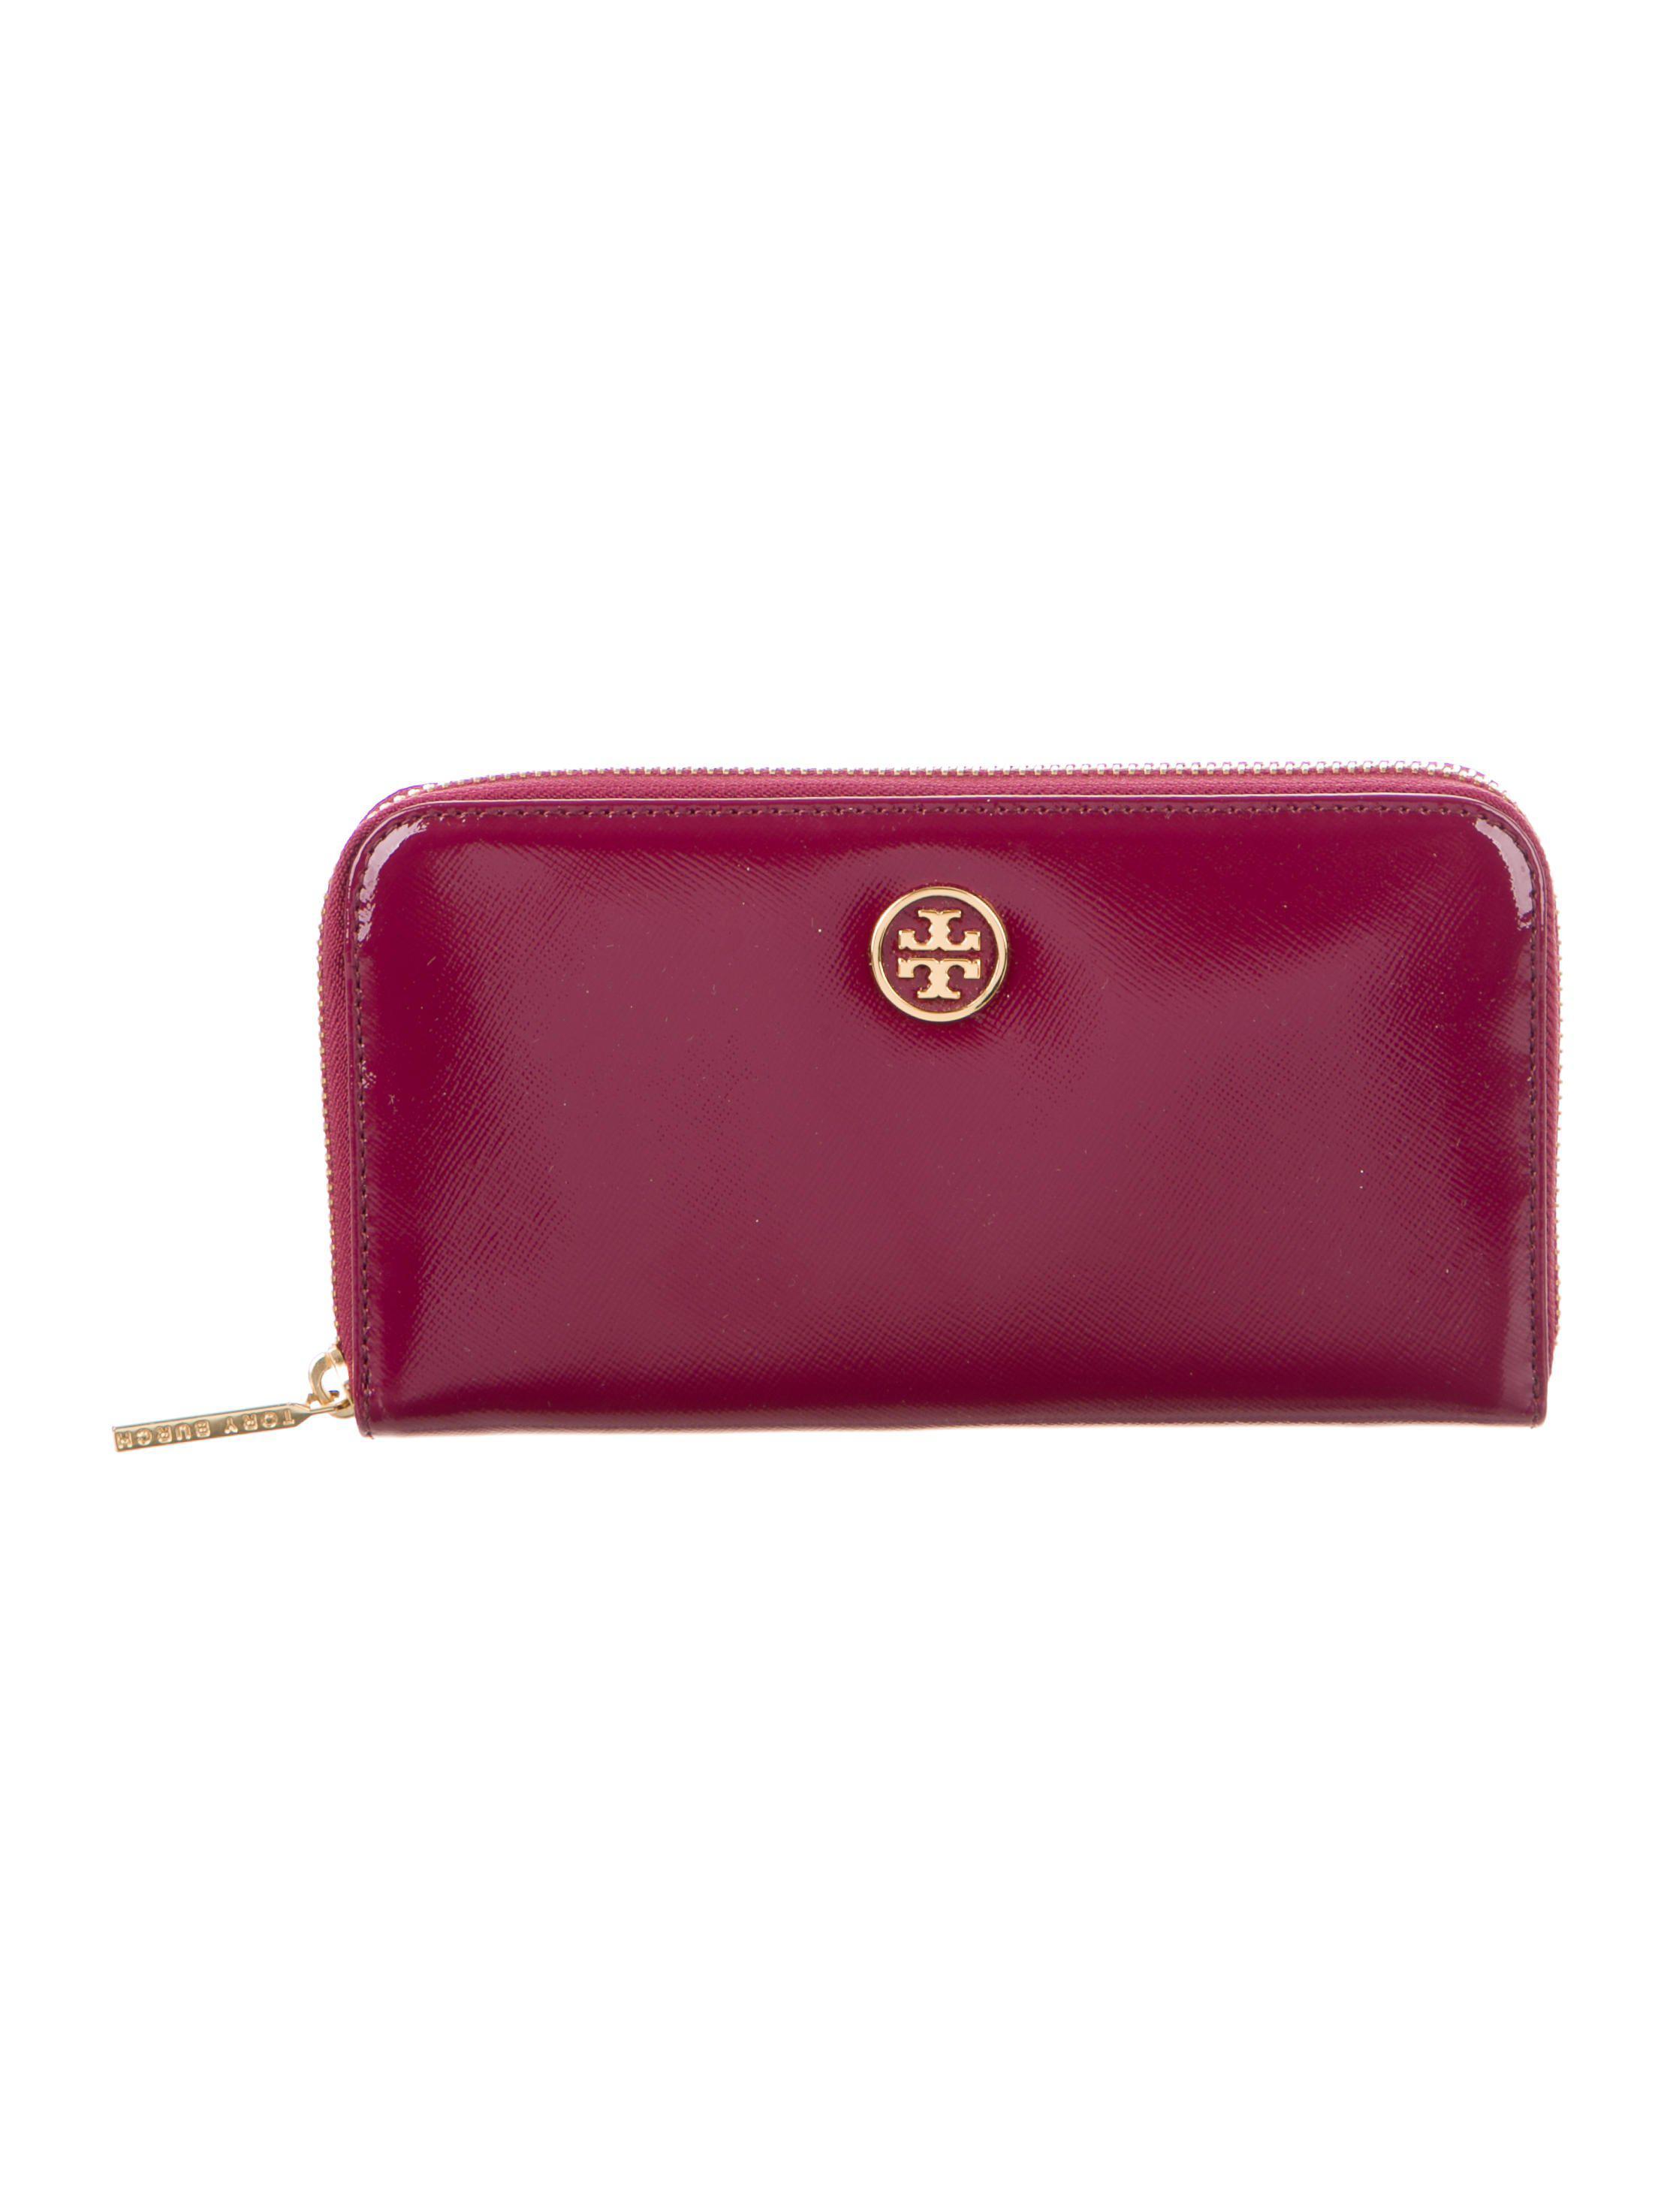 5163bdf3d1e Tory Burch. Women s Metallic Patent Leather Robinson Zip Continental Wallet  Gold